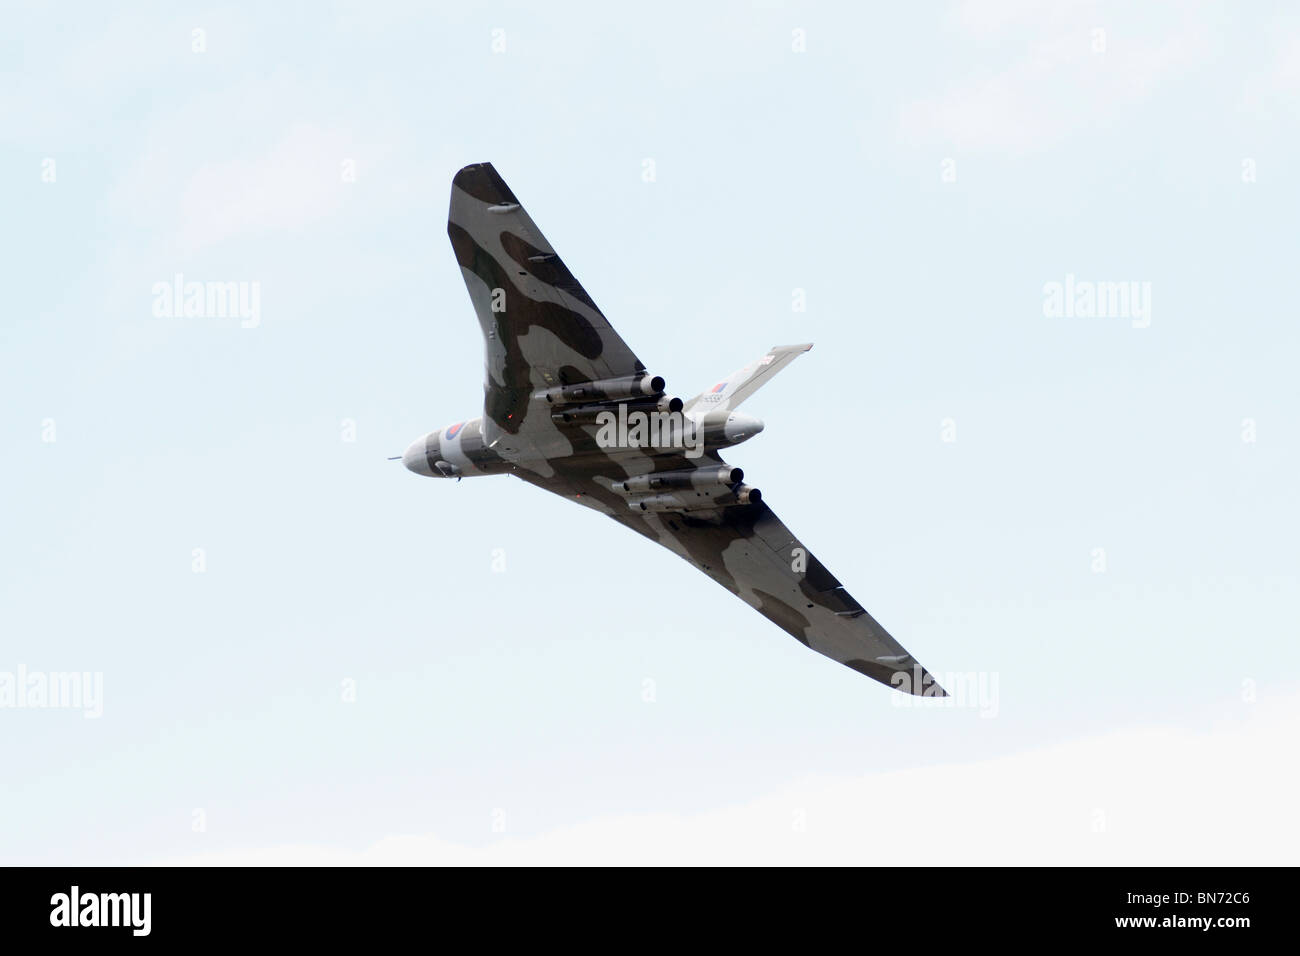 AVRO Vulcan RAF Waddington, Lincoln, International Airshow. Avro Vulcan XH558 (civil aircraft registration G-VLCN) - Stock Image